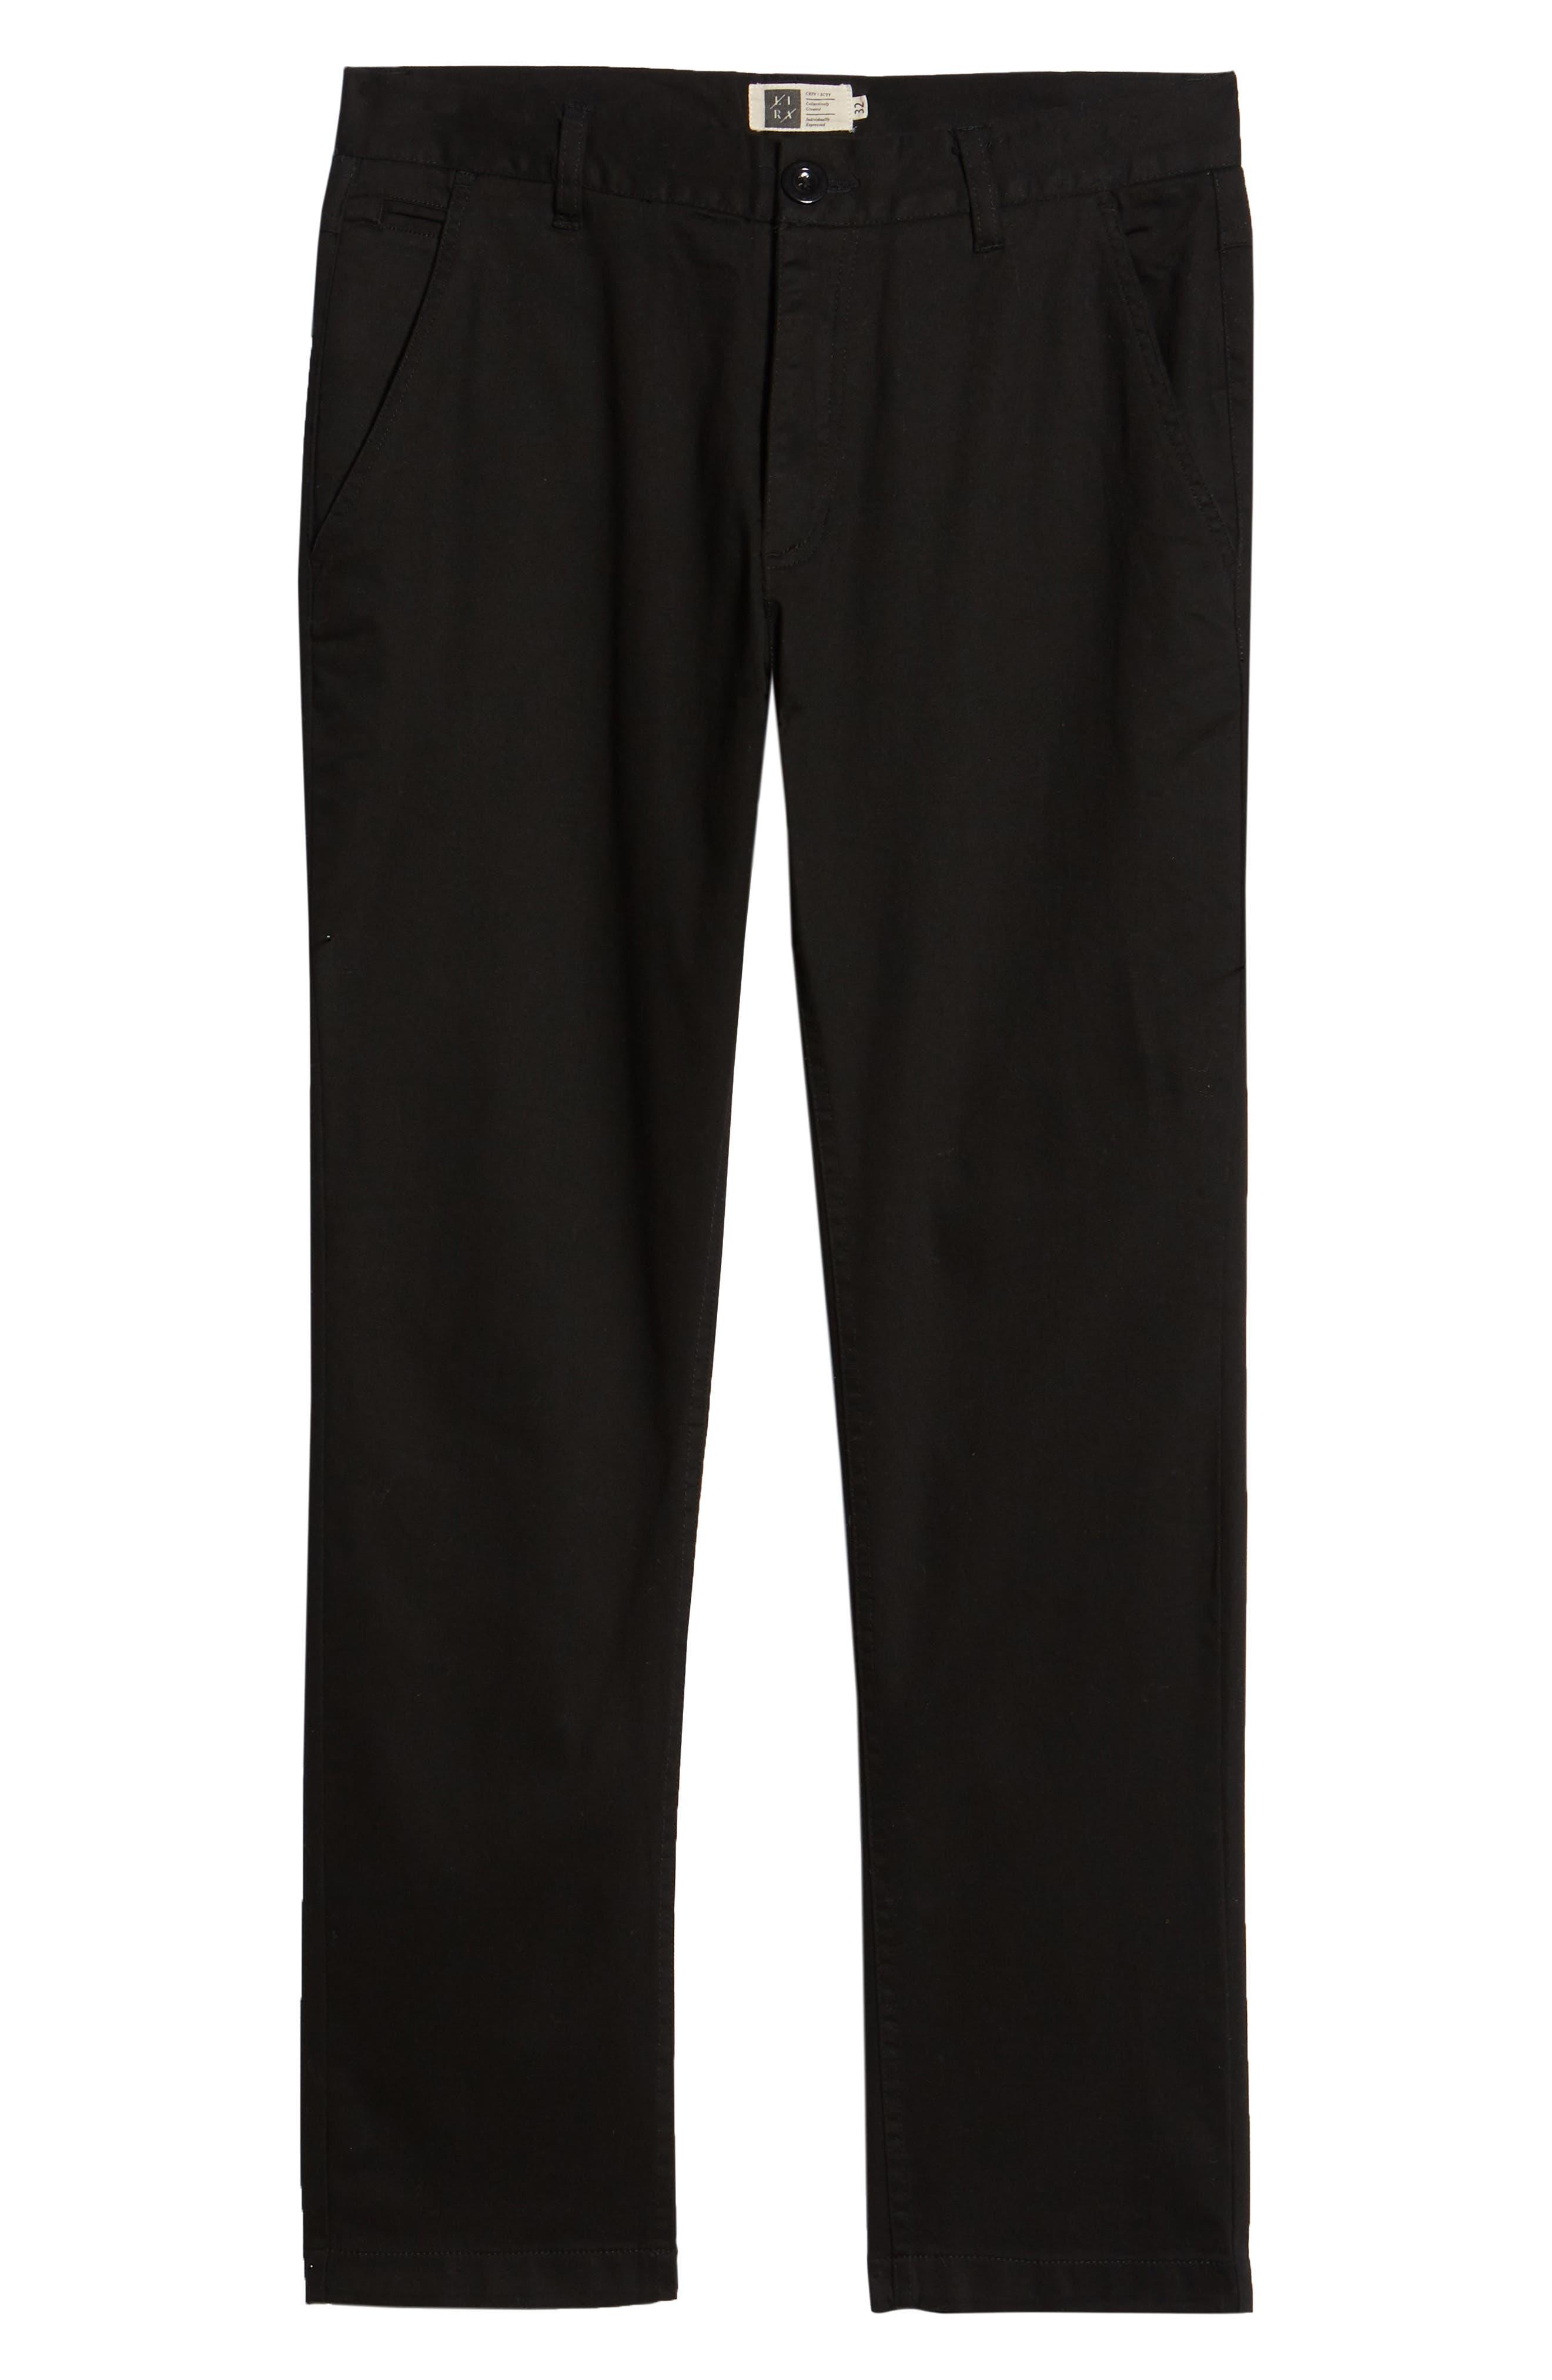 Vacation Slim Fit Crop Pants,                             Alternate thumbnail 6, color,                             BLACK